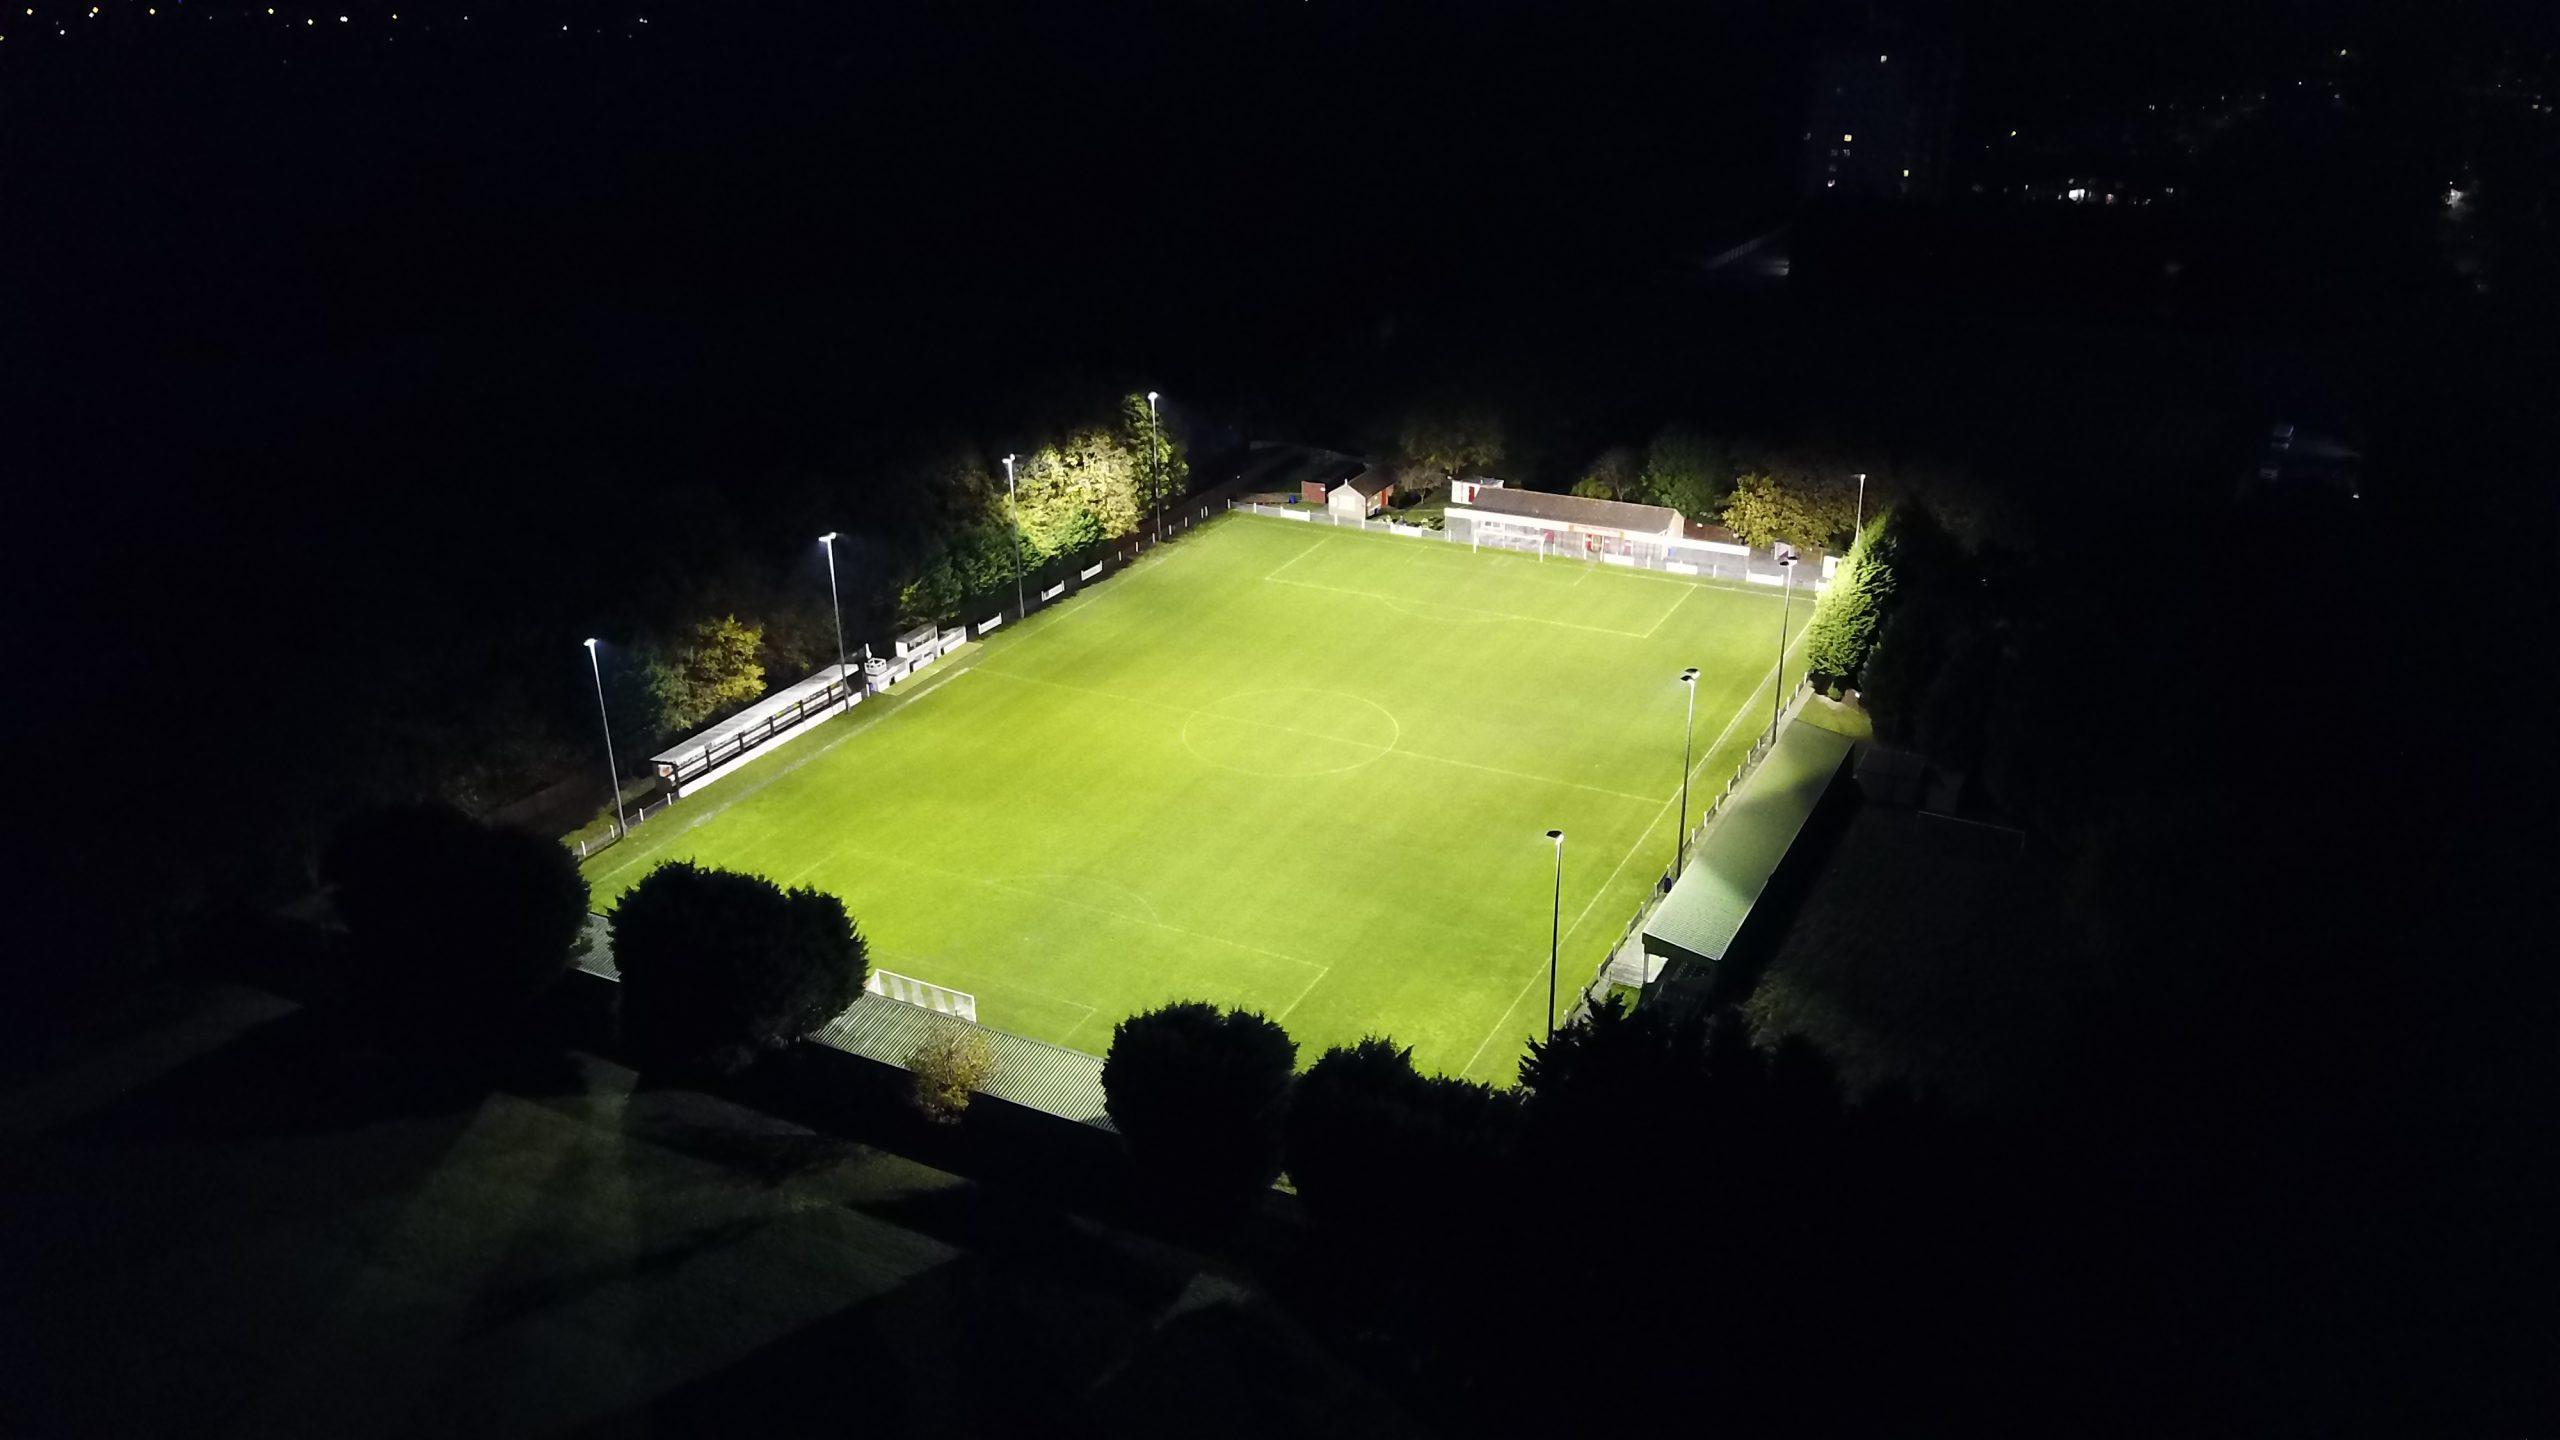 lincoln united football club